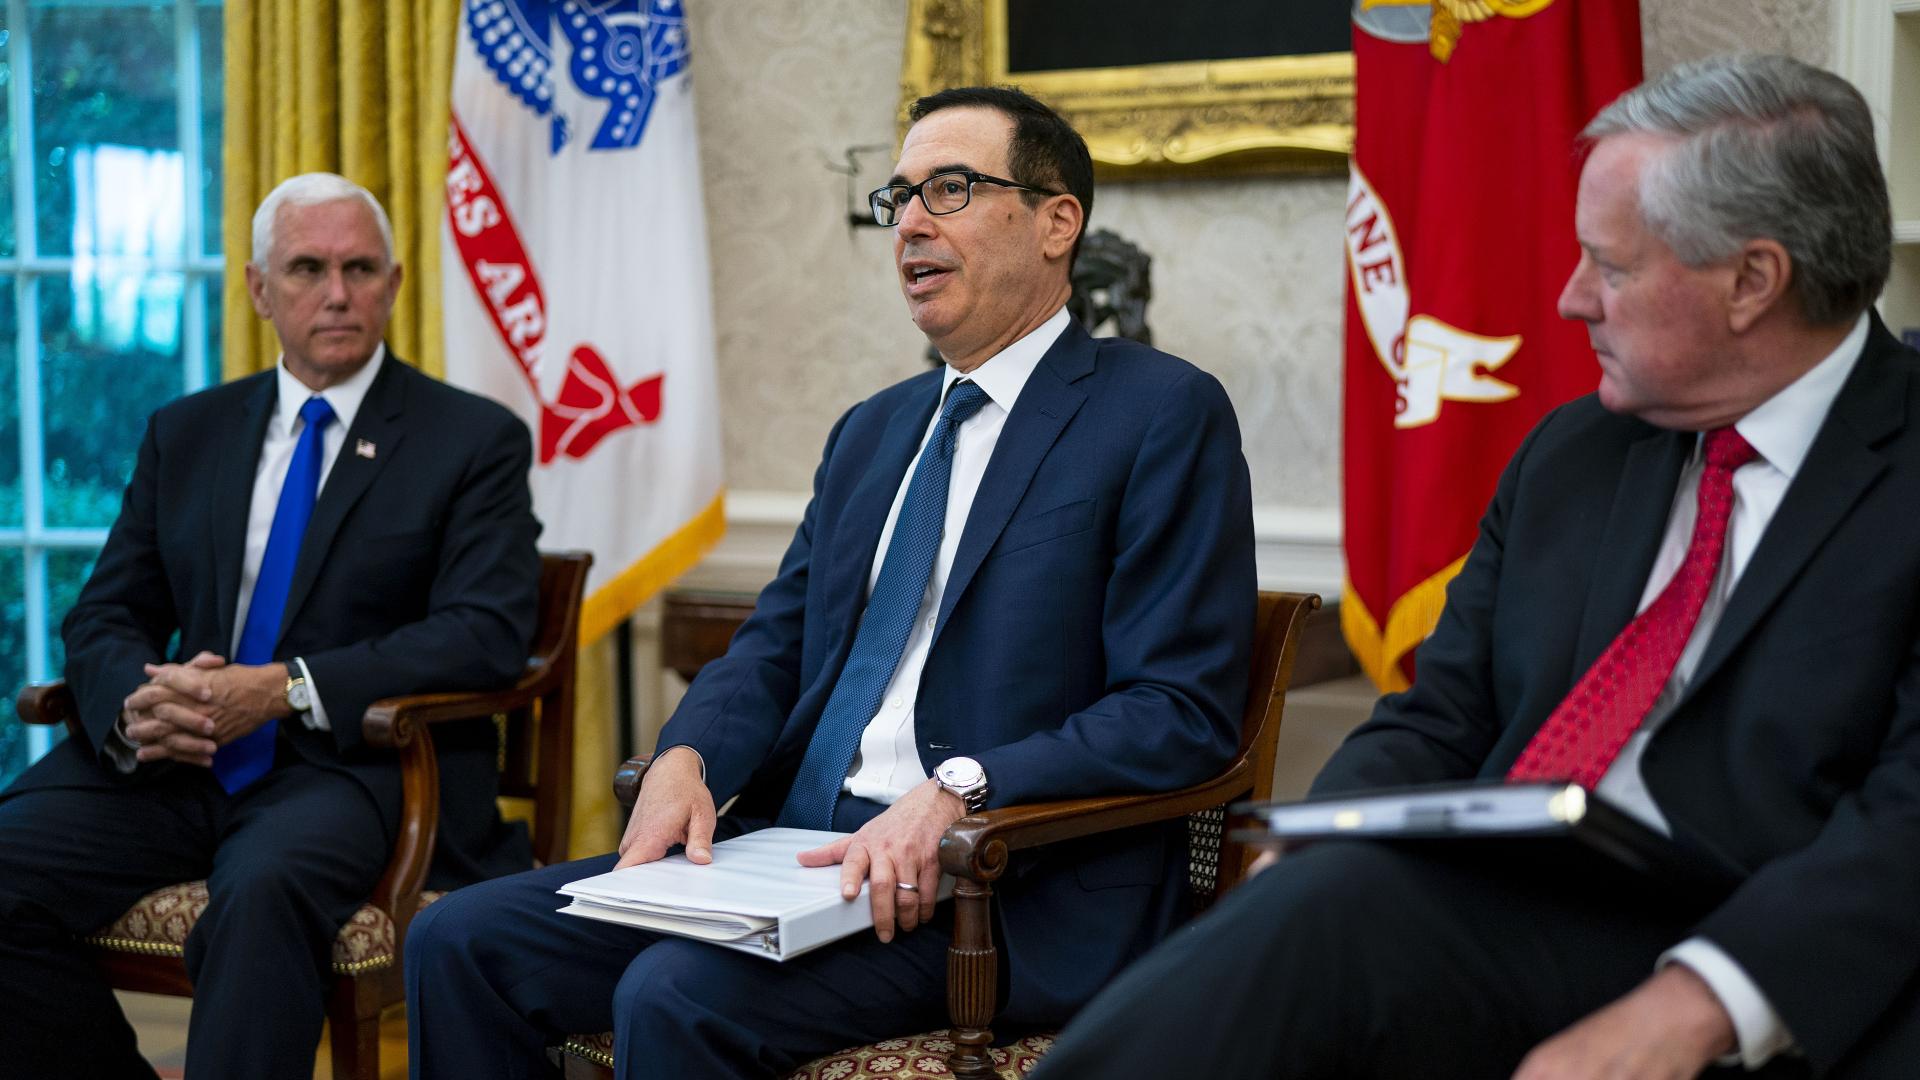 (L-R) Vice President Mike Pence, Treasury Secretary Steven Mnuchin and White House Chief of Staff Mark Meadows